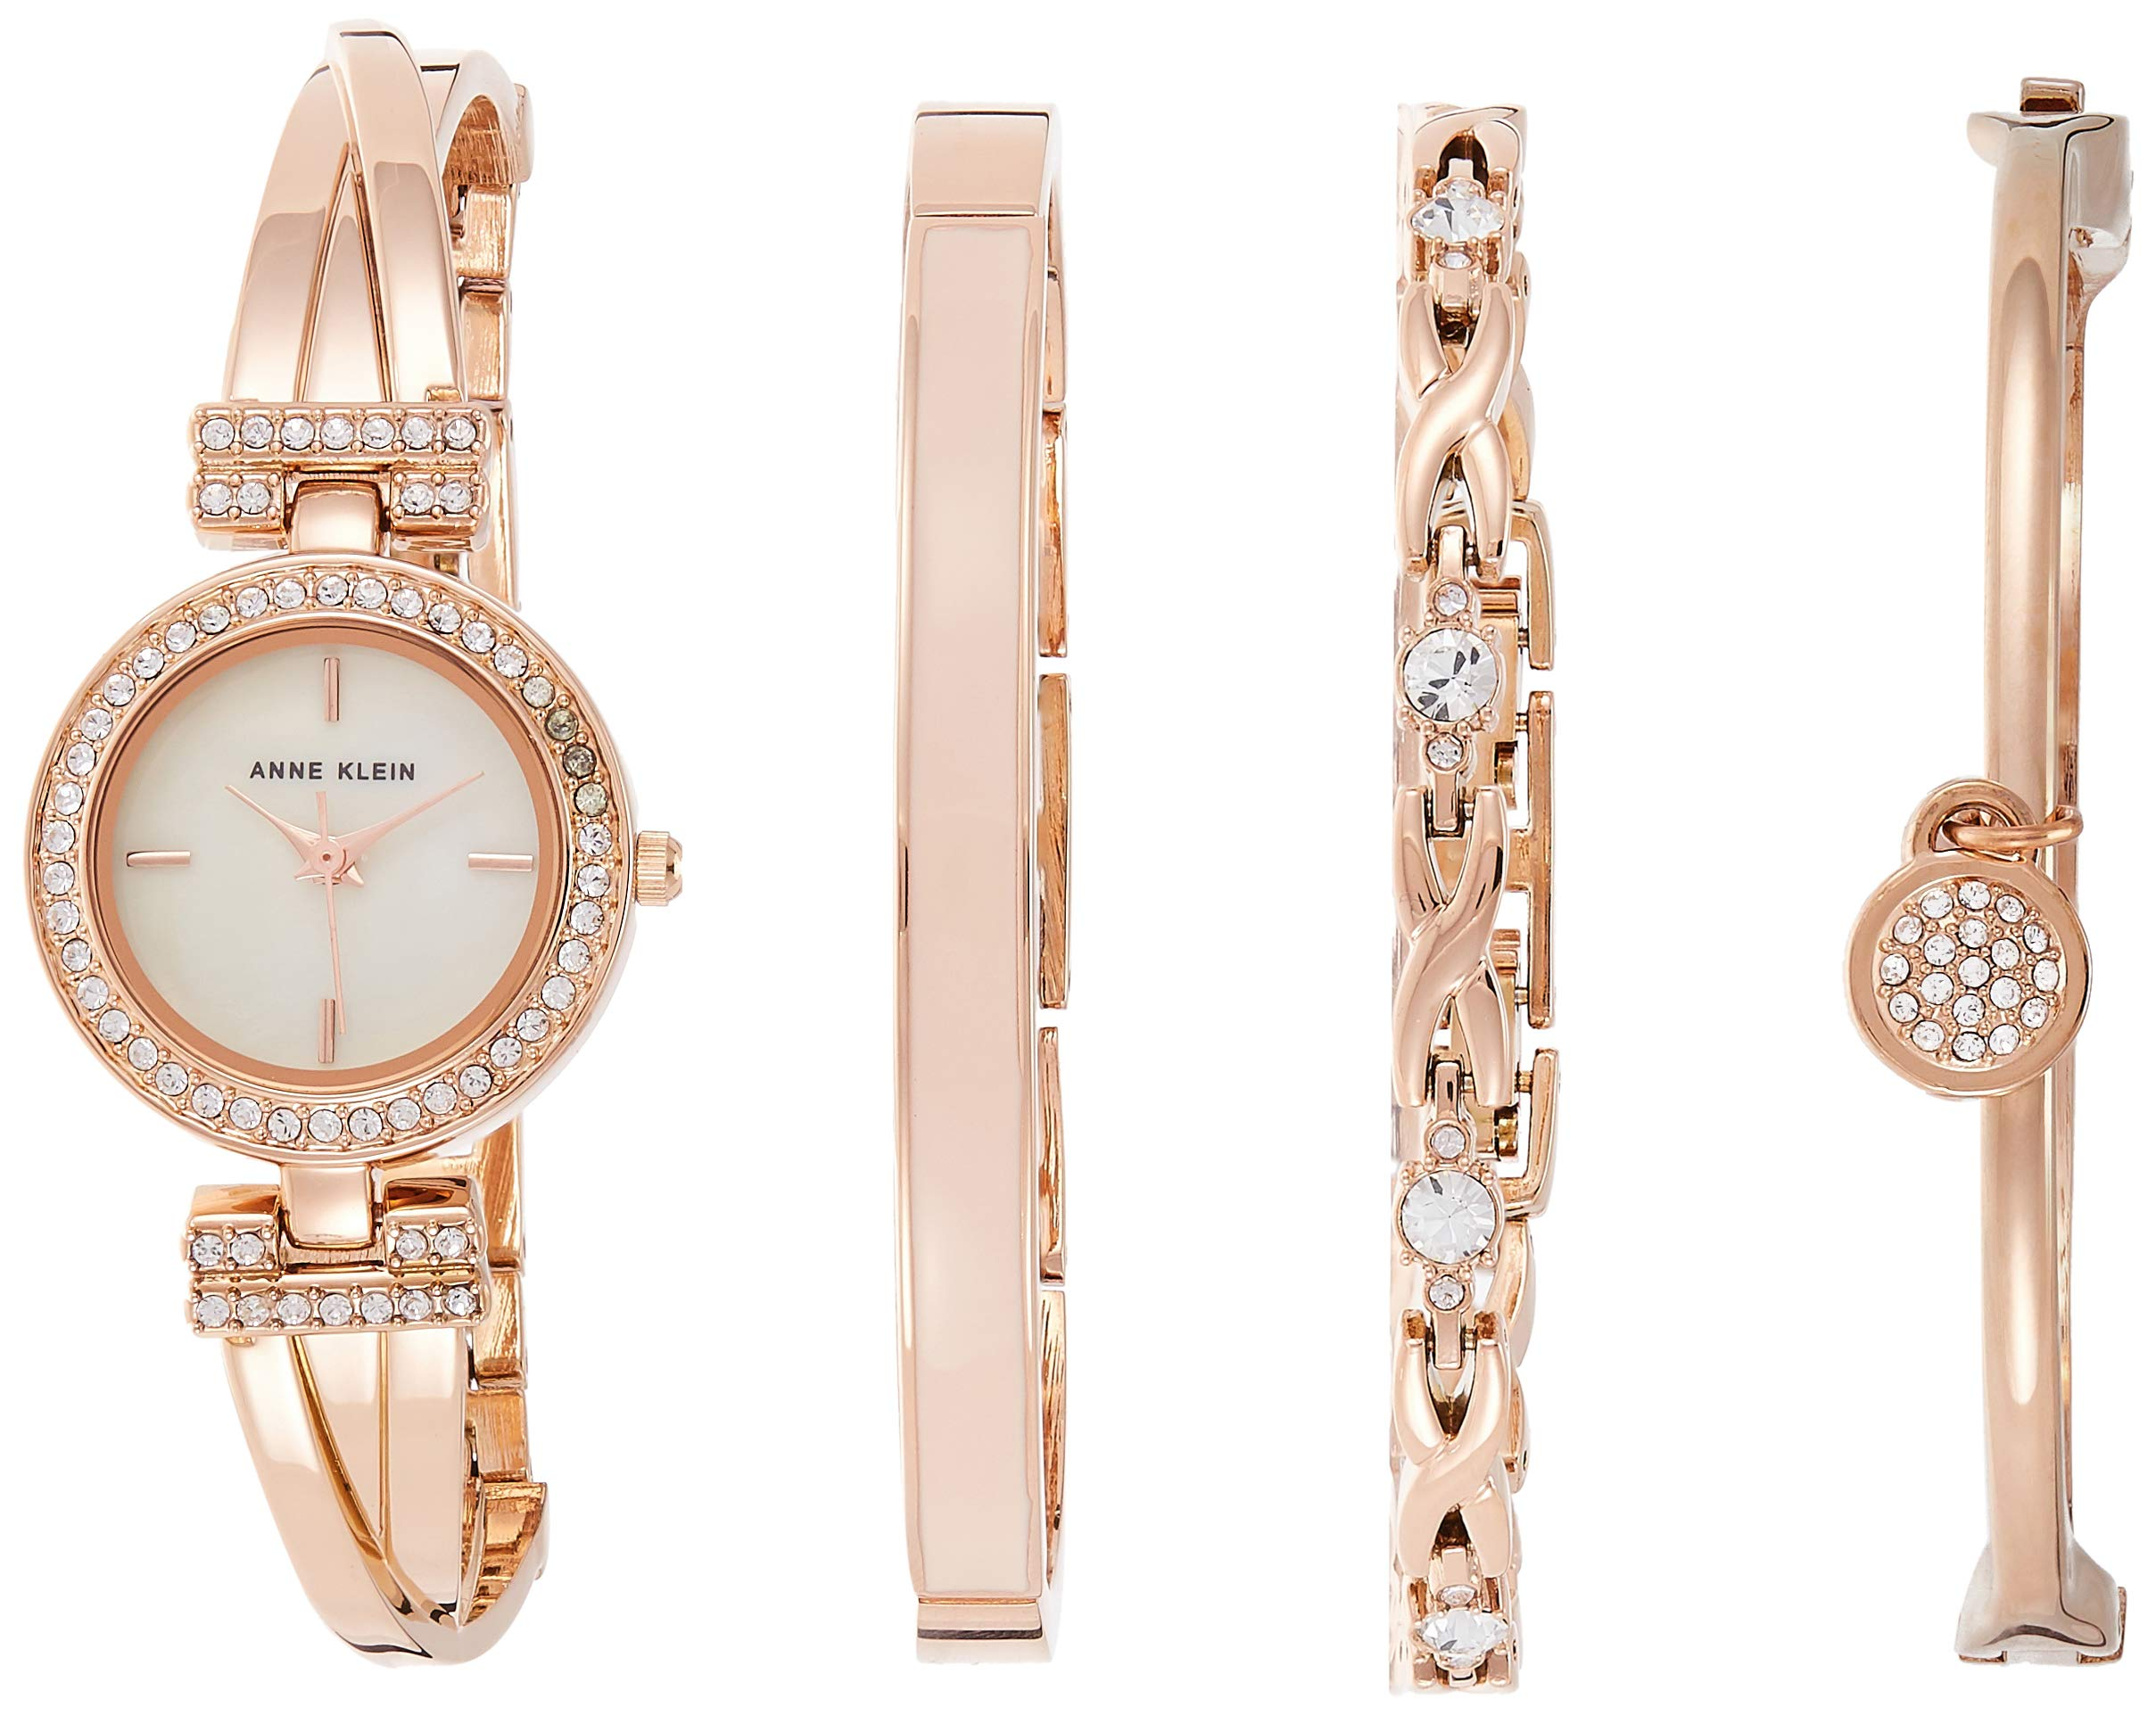 Anne Klein Women's AK/2238RGST Swarovski Crystal-Accented Rose Gold-Tone Bangle Watch and Bracelet Set by Anne Klein